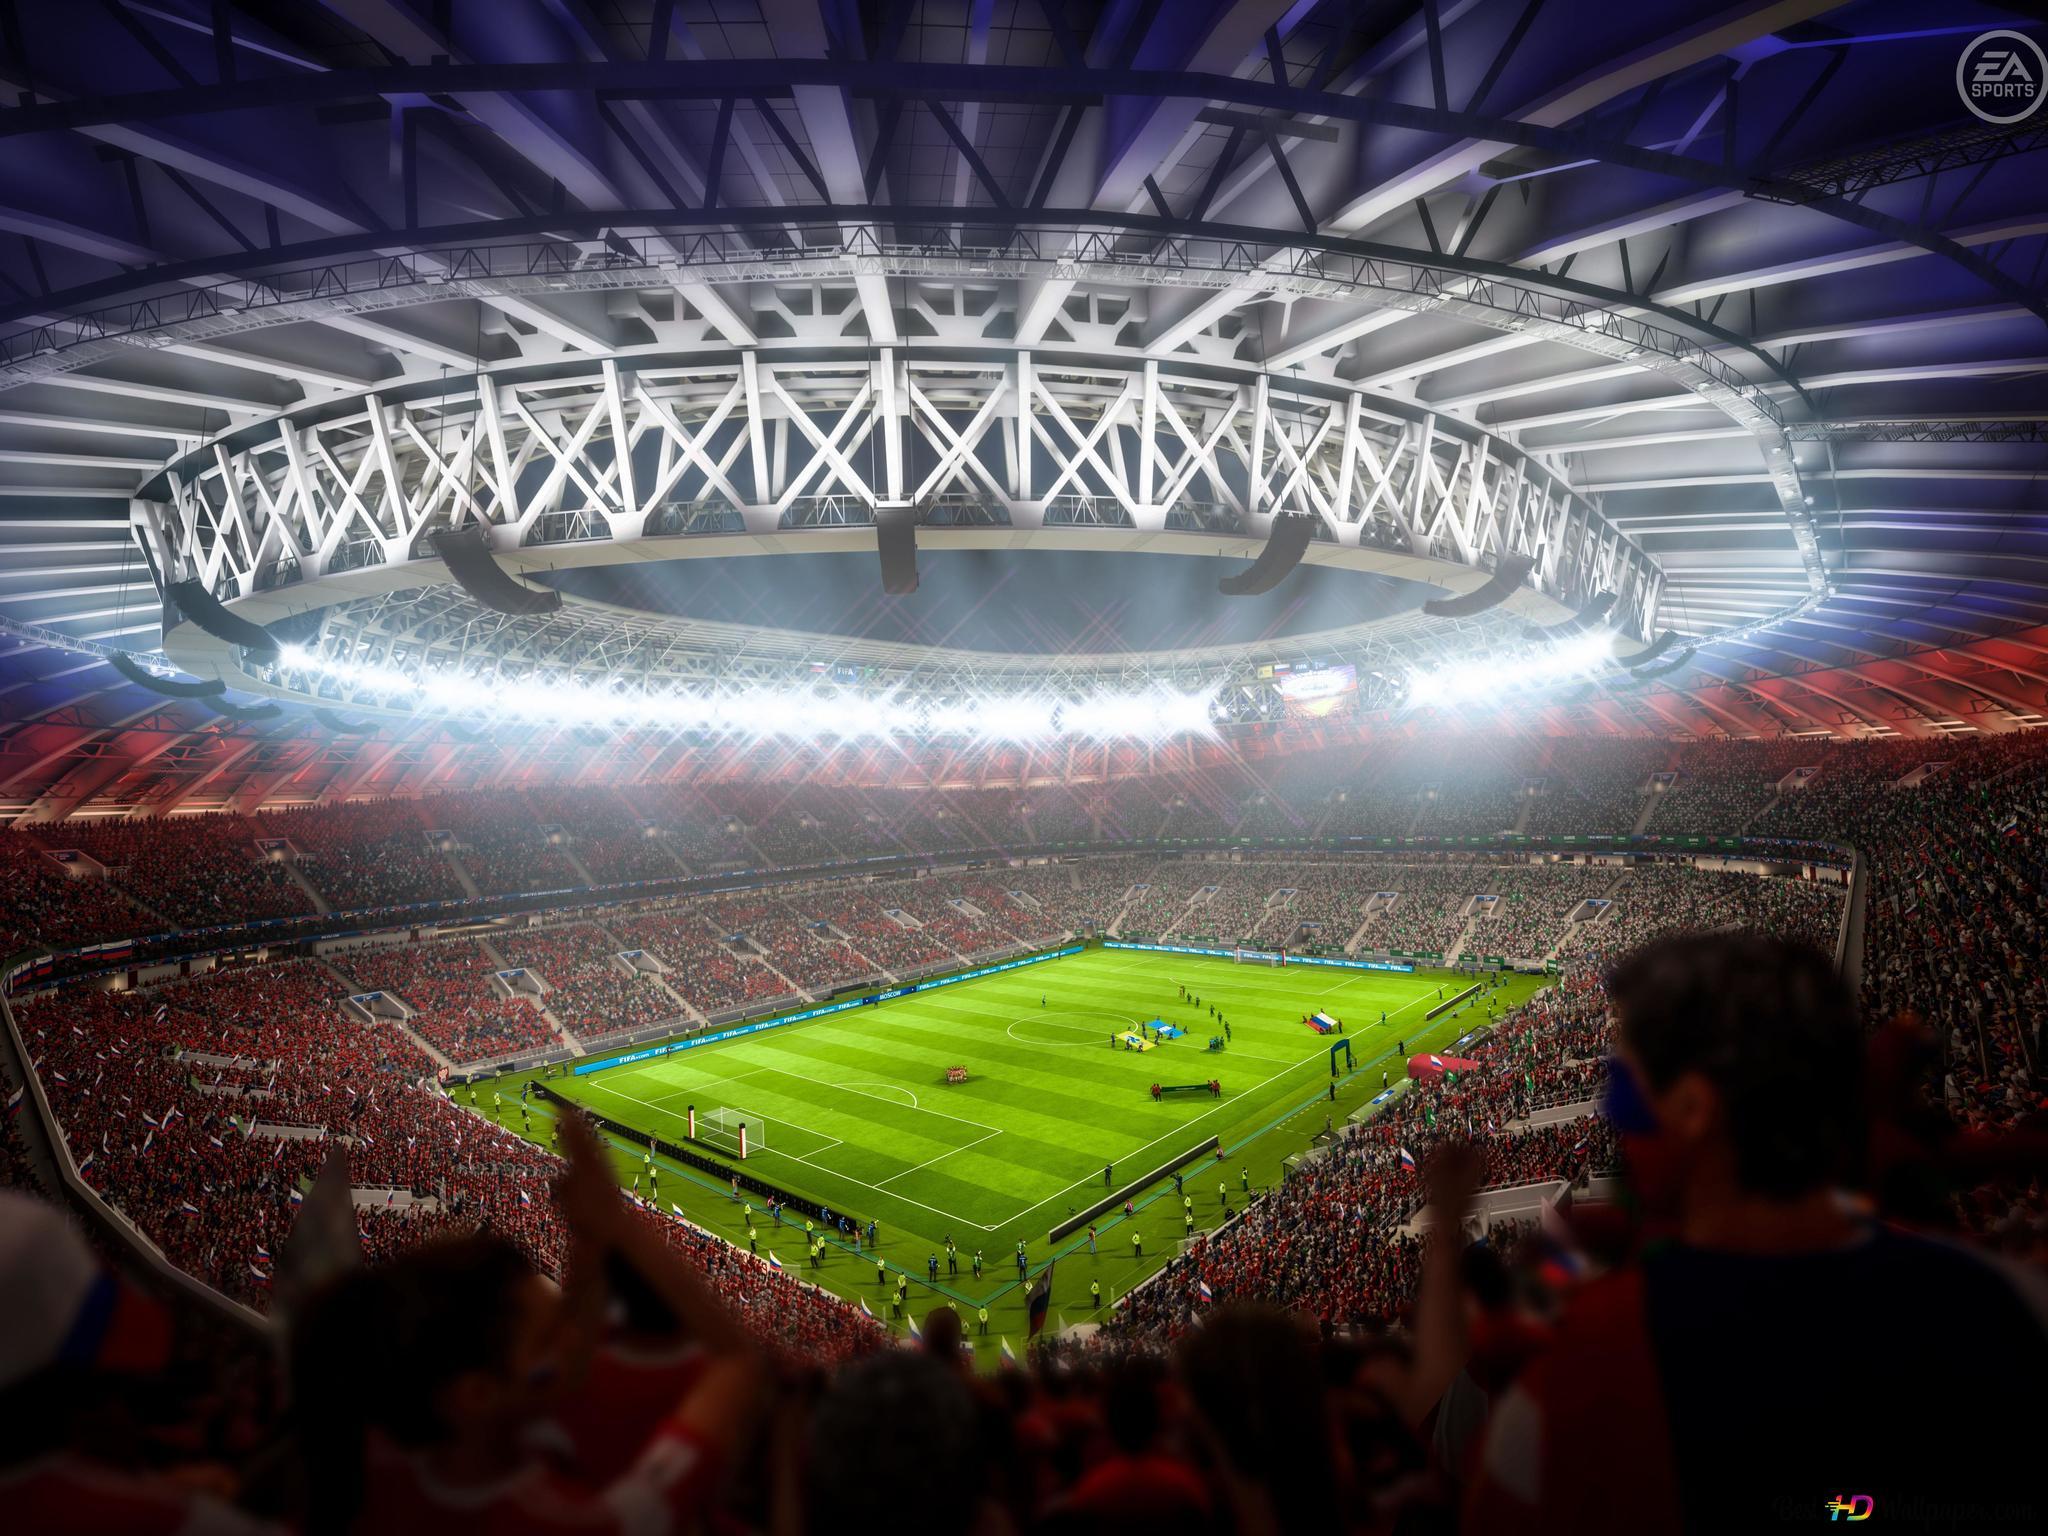 FIFA 18 - Stadium HD wallpaper download